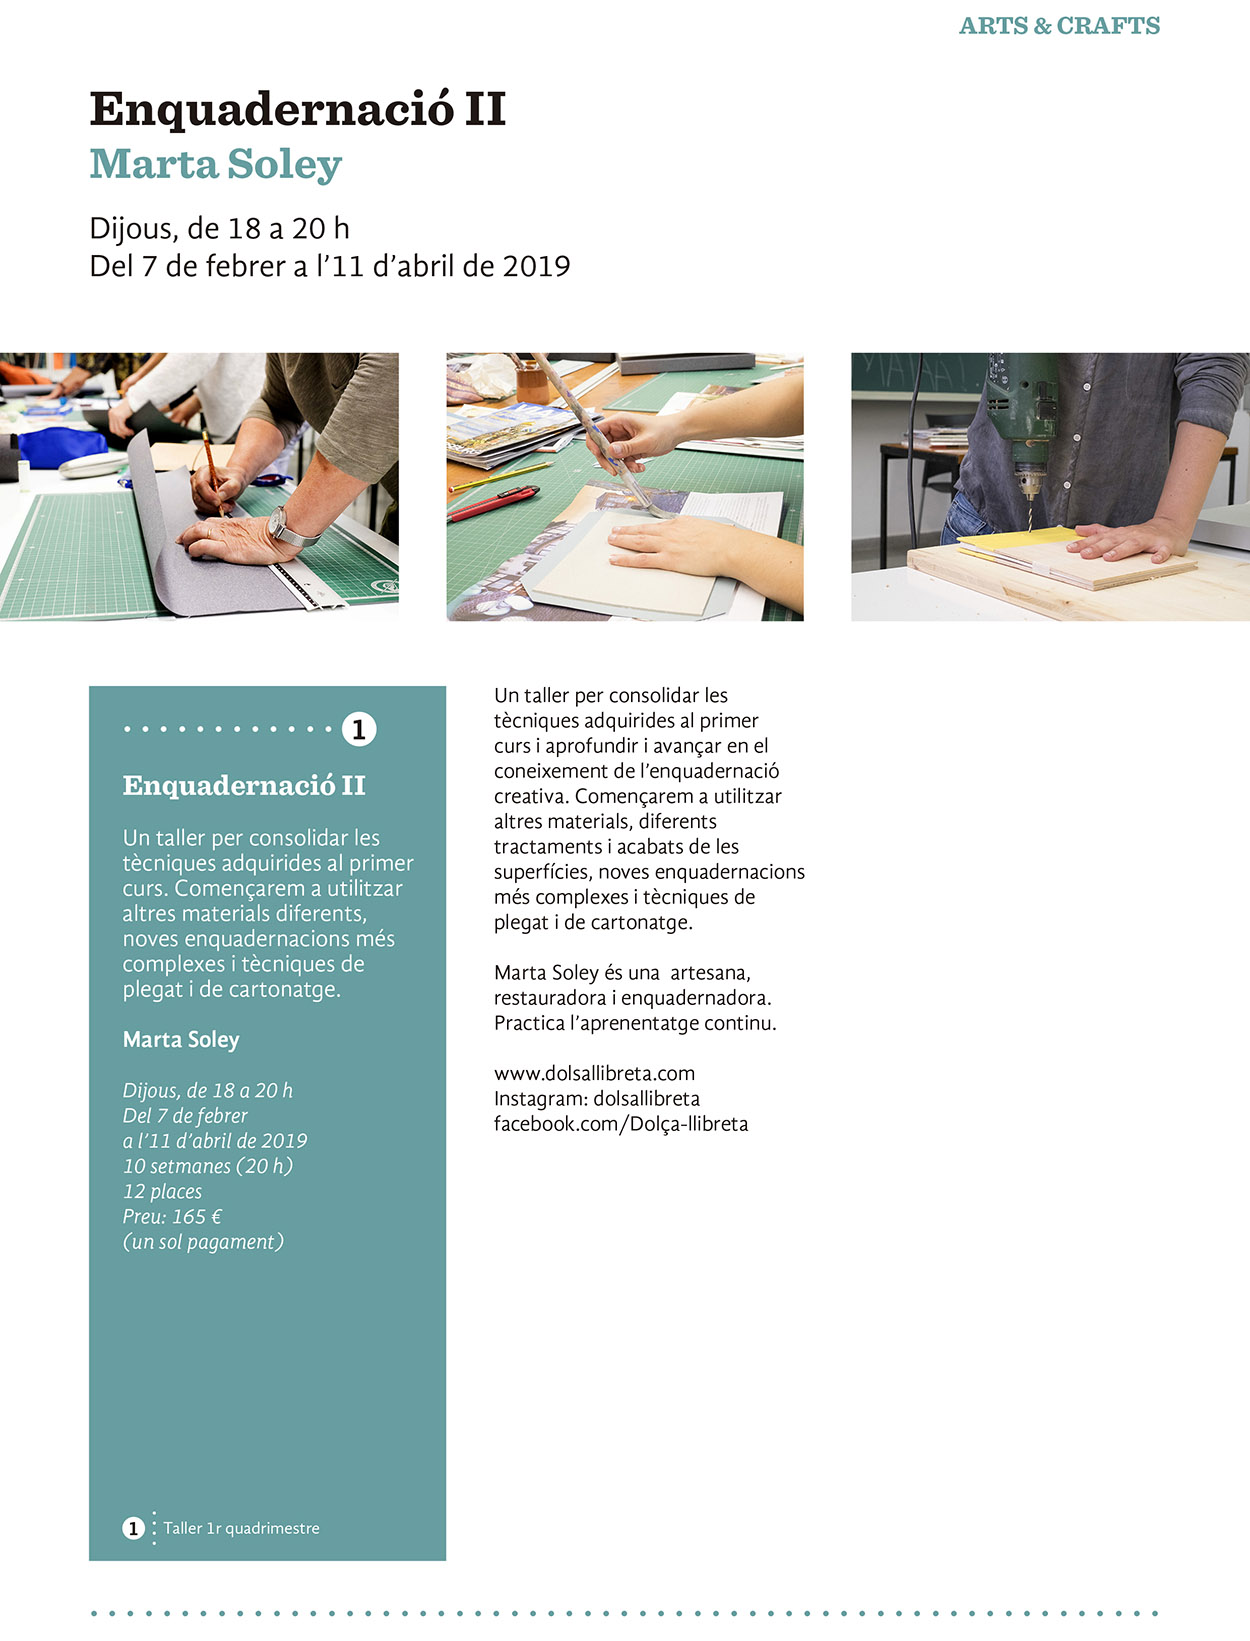 fulleto_tallers_promo-enquadernacio2_blog